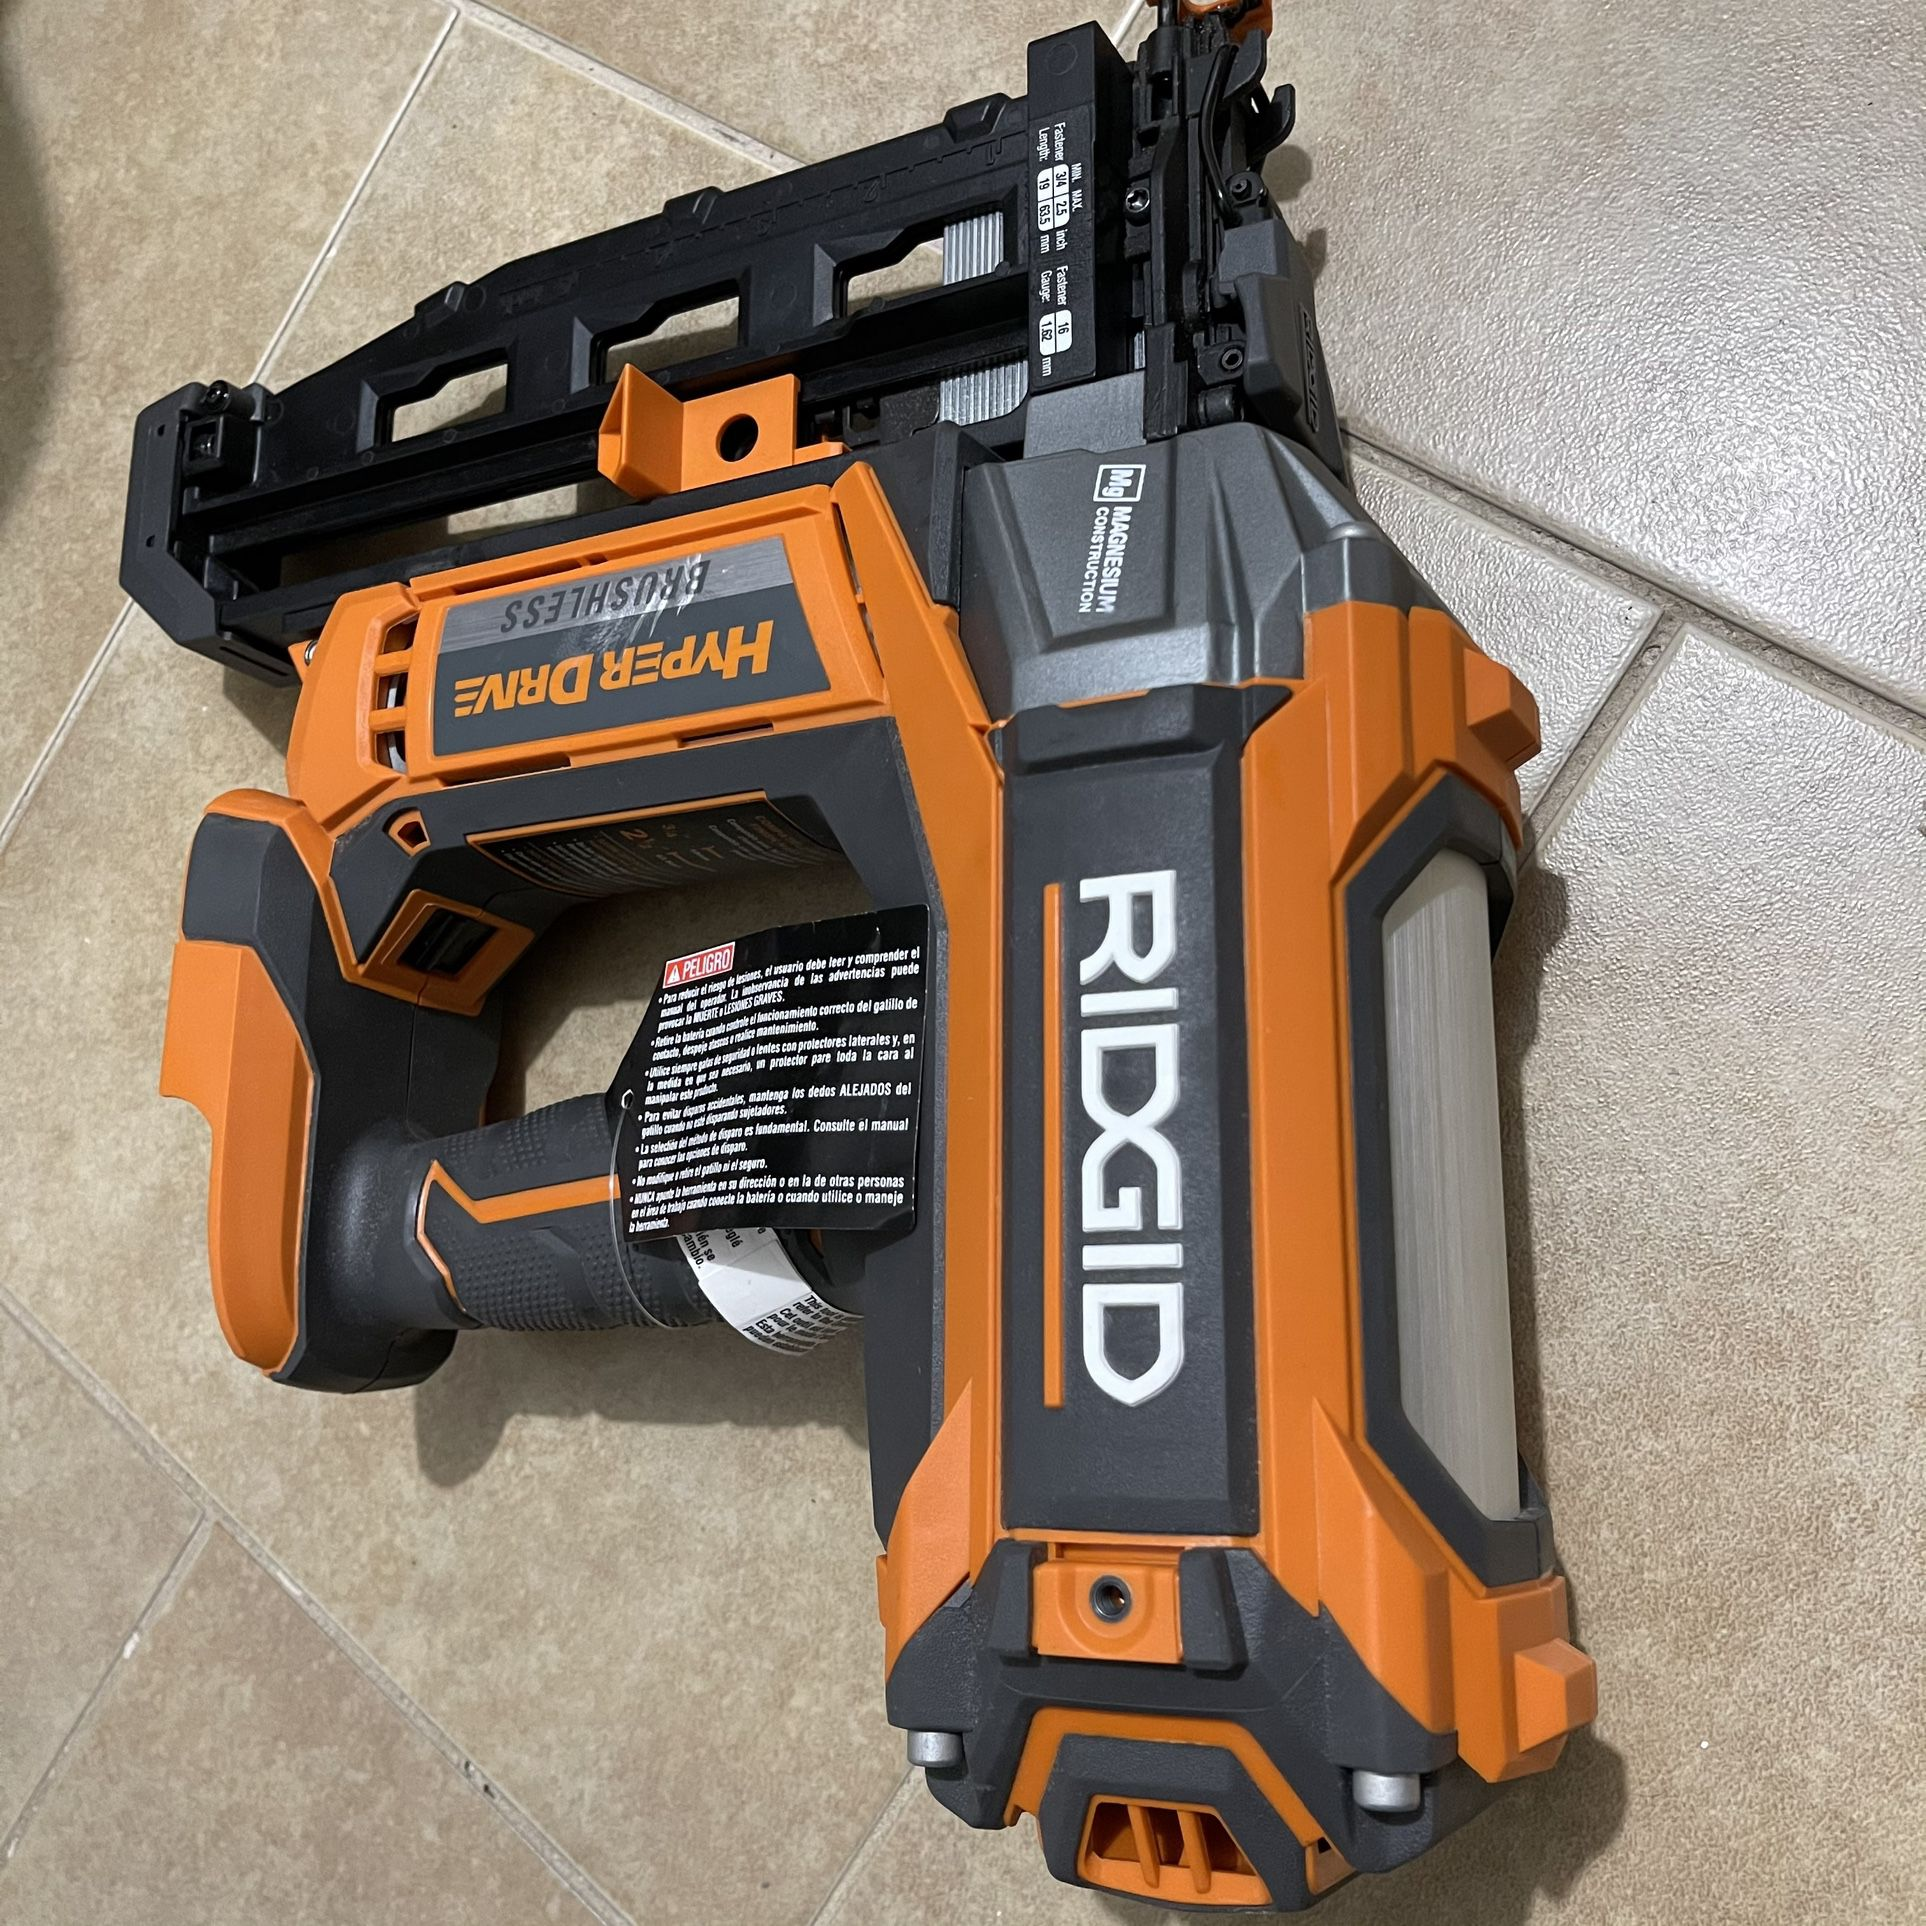 Ridgid 18v Brushless 16ga Finish Nailer(tool Only)